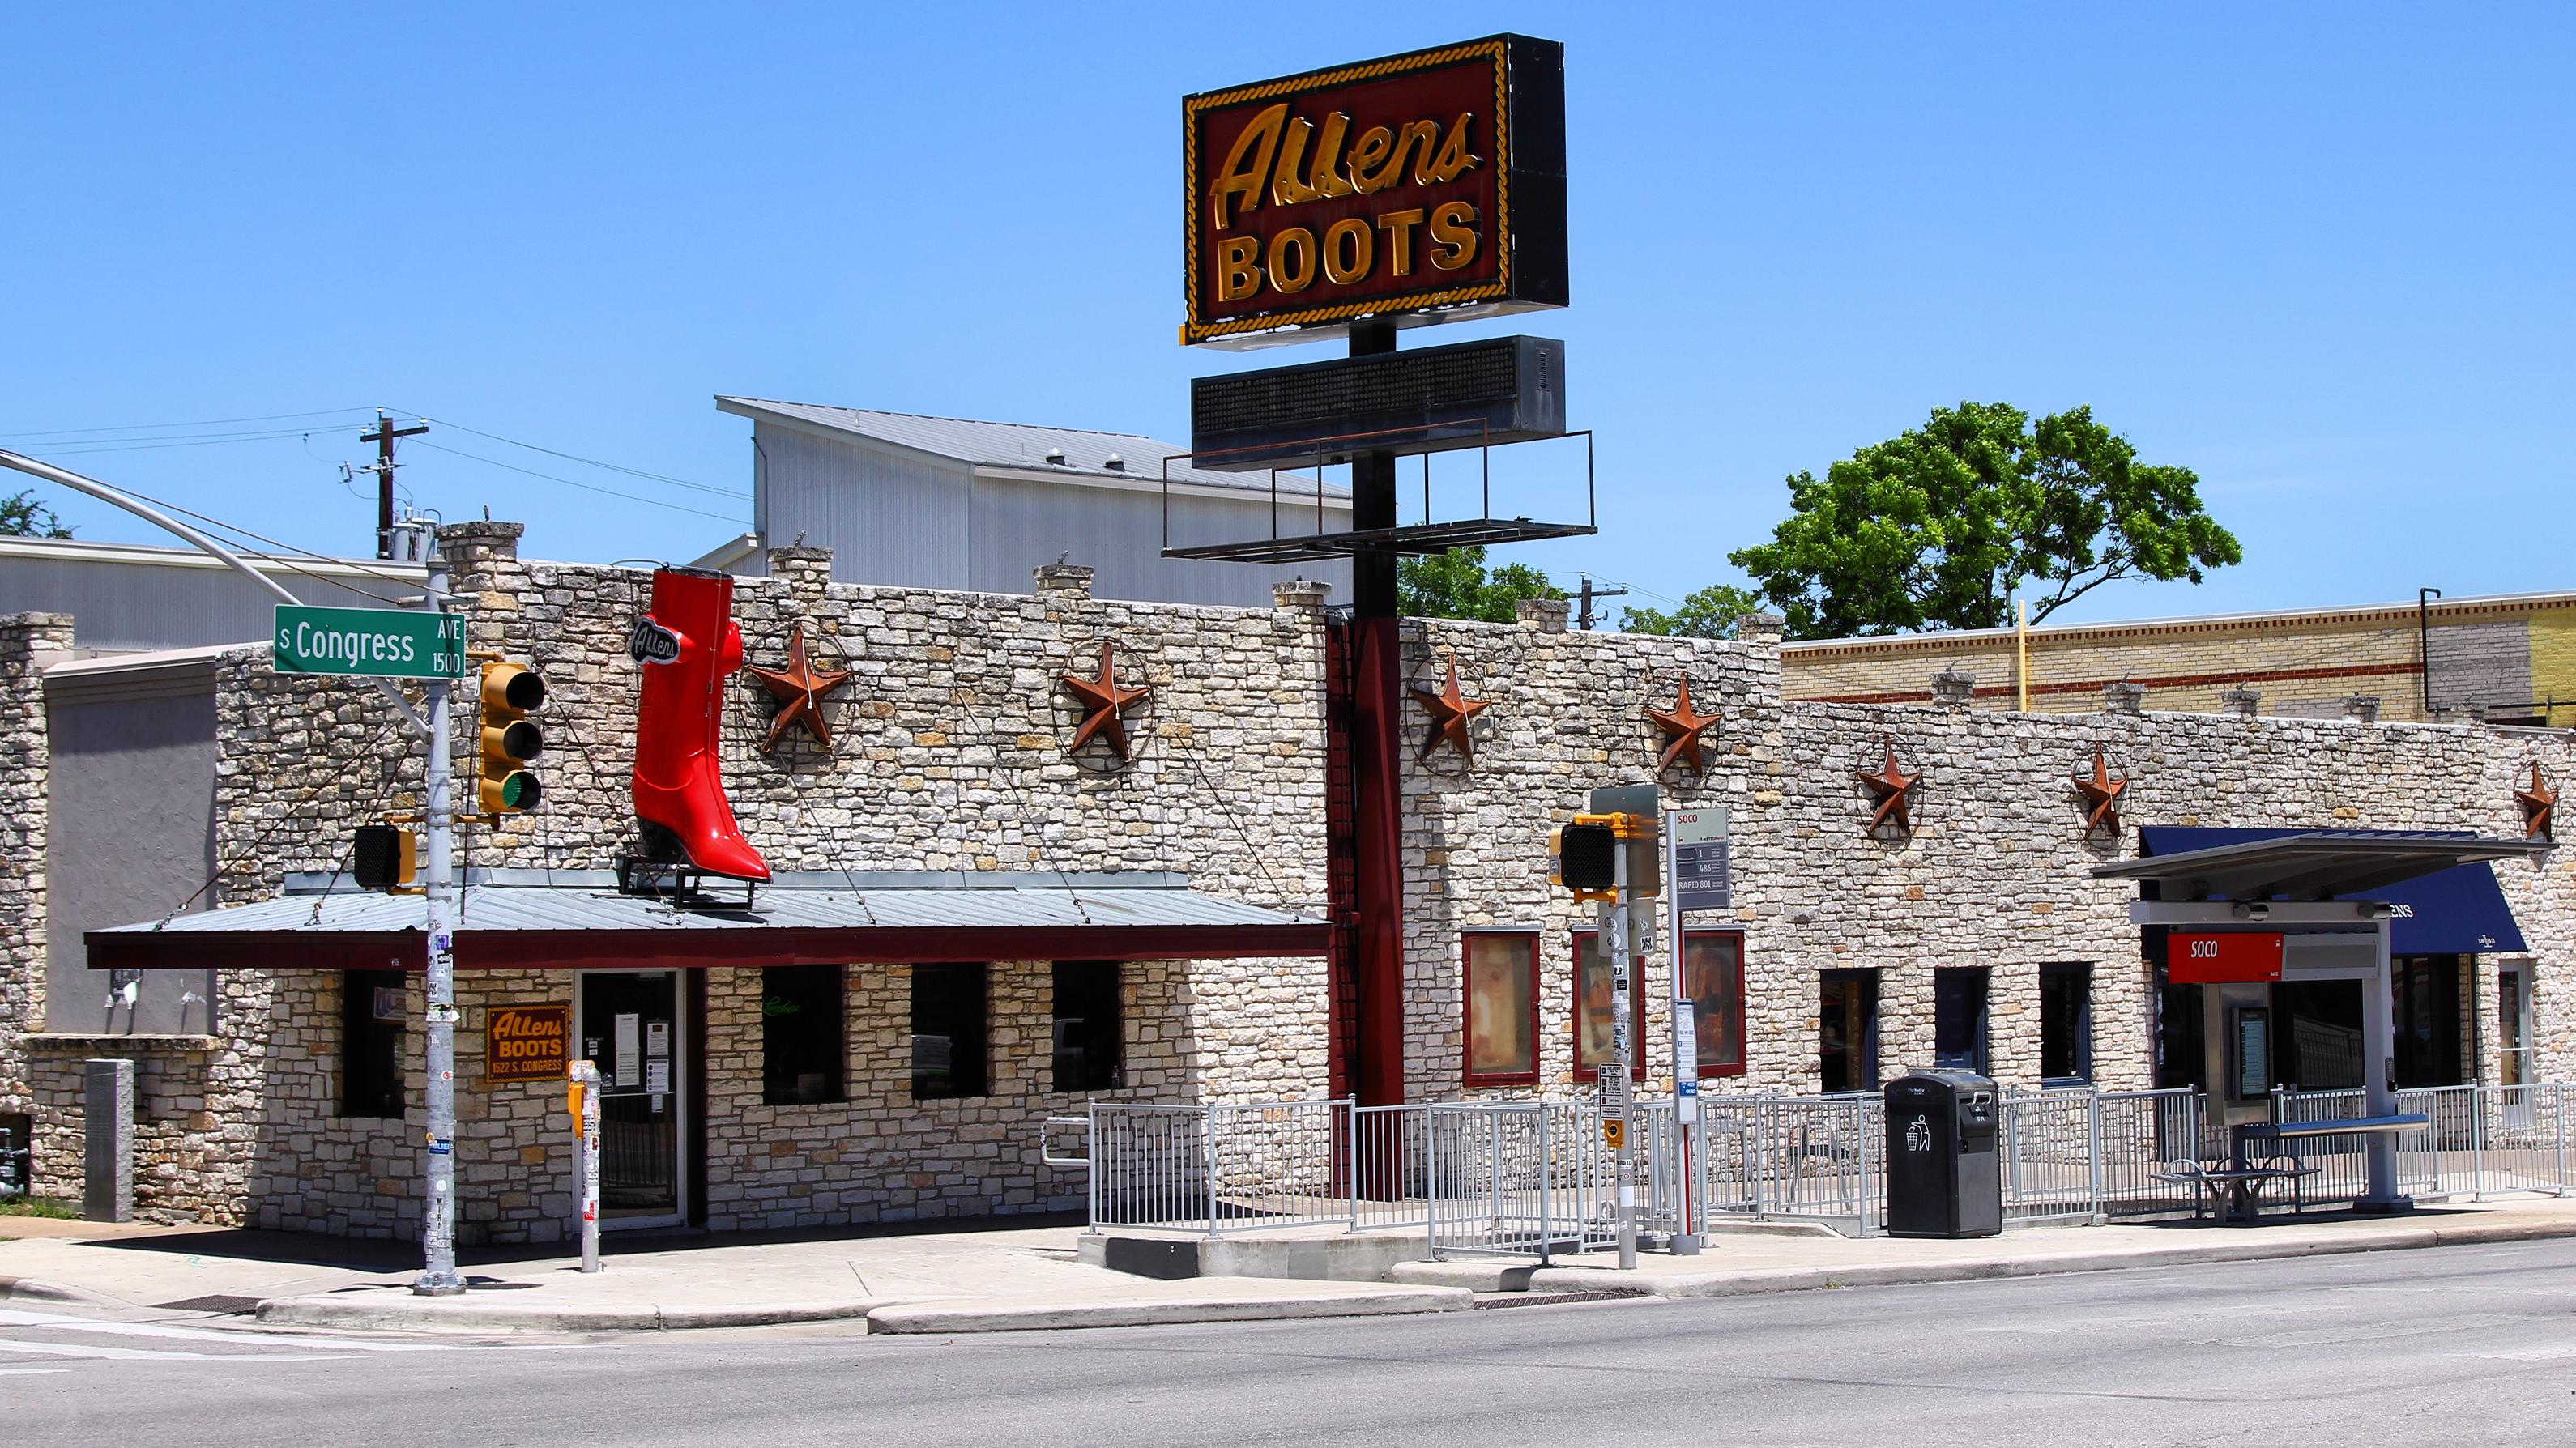 Allens Boots Austin Texas 2020.jpg